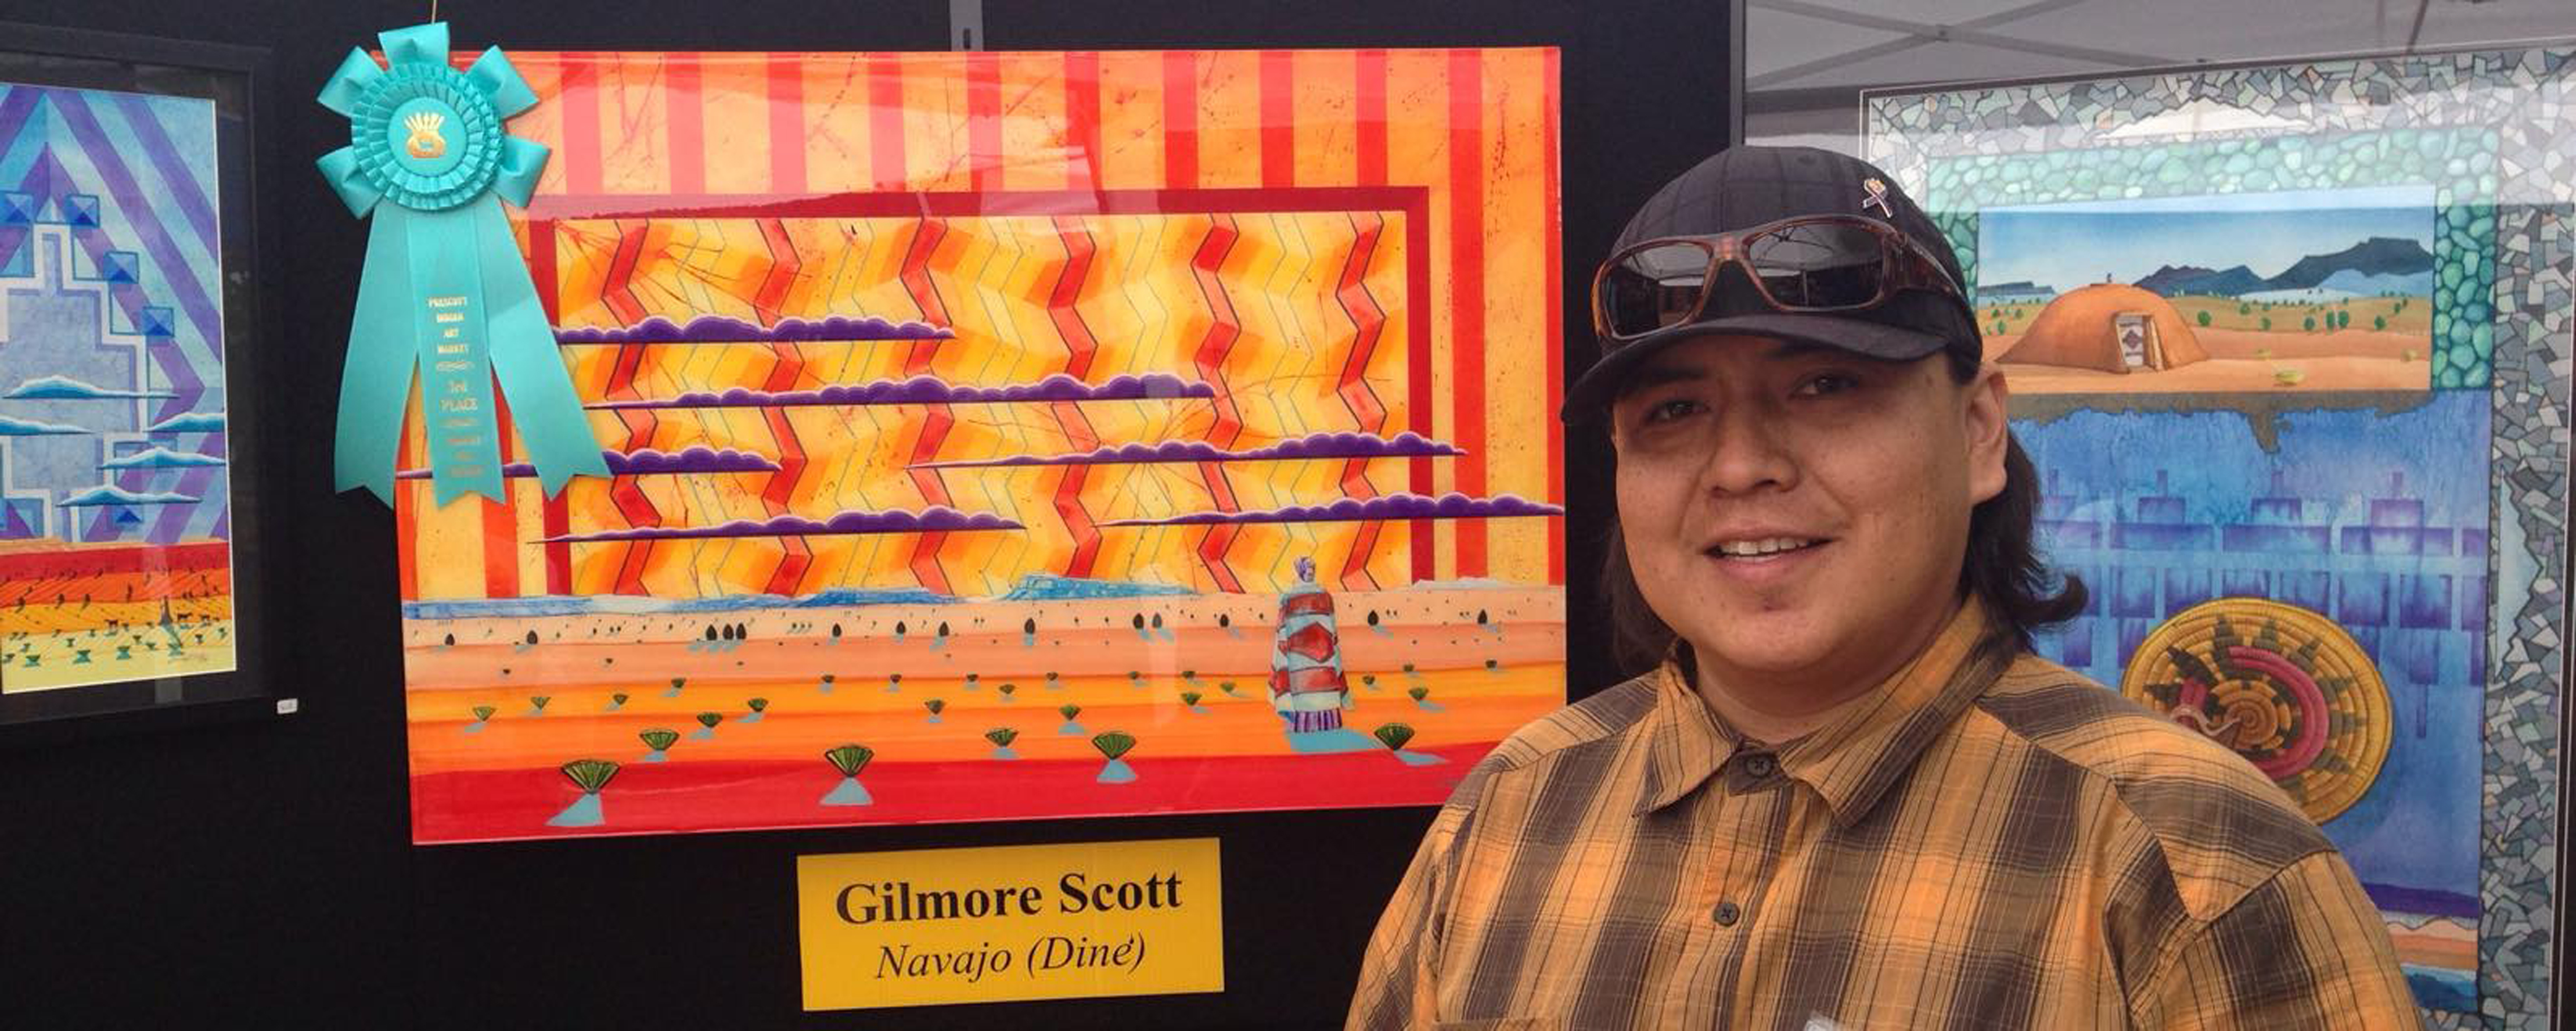 Gilmore Scott